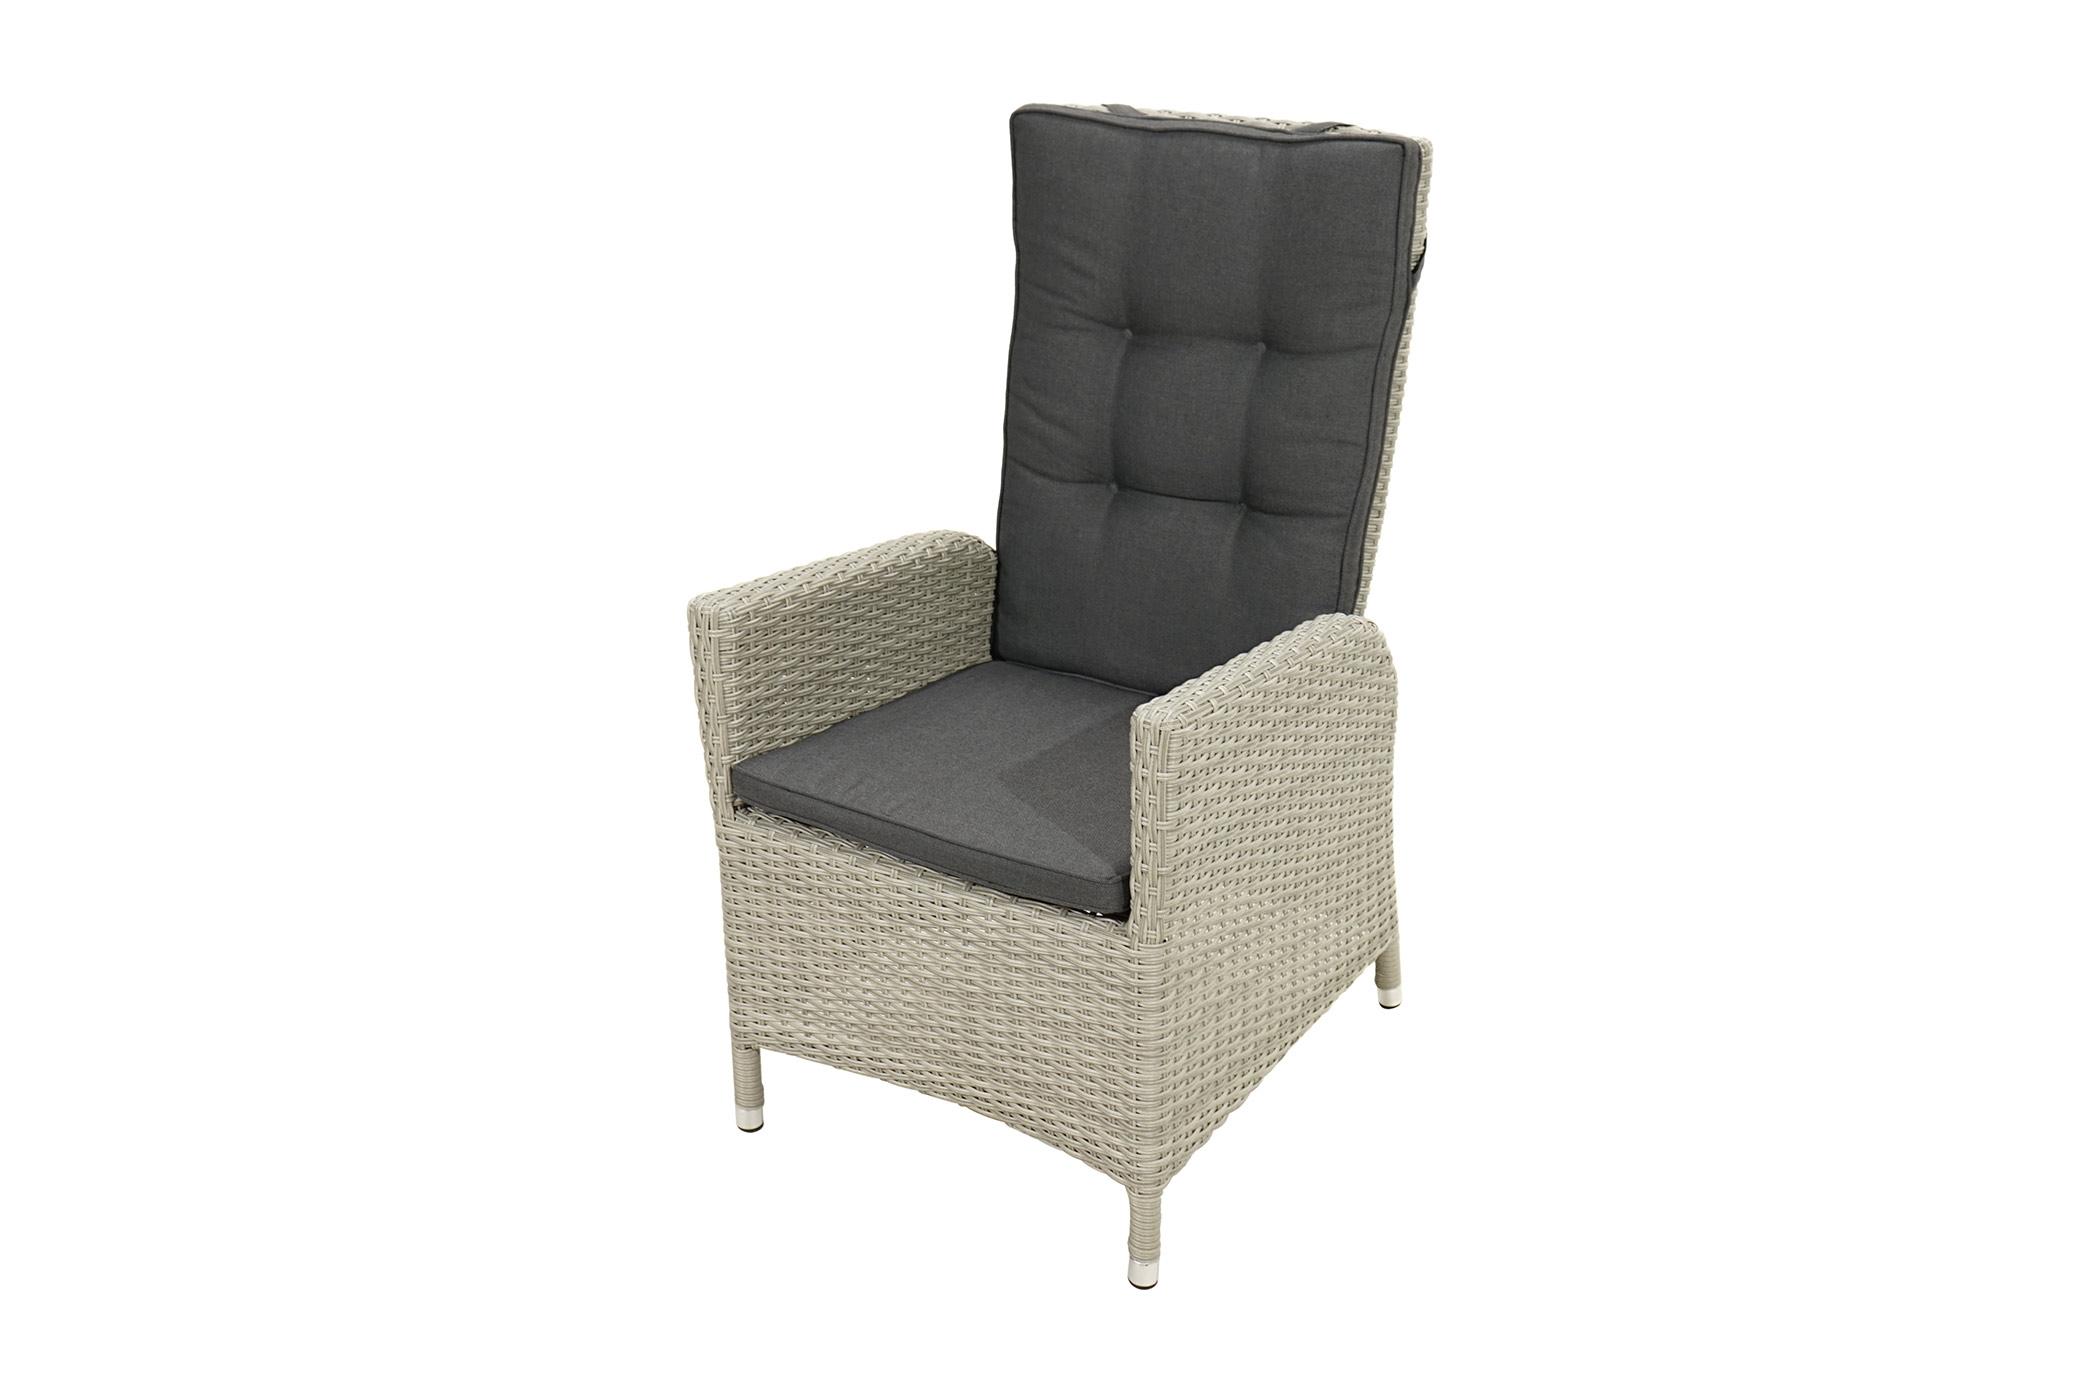 diningsessel catania polyrattangeflecht catania plo kollektionen gardanio ihr online. Black Bedroom Furniture Sets. Home Design Ideas